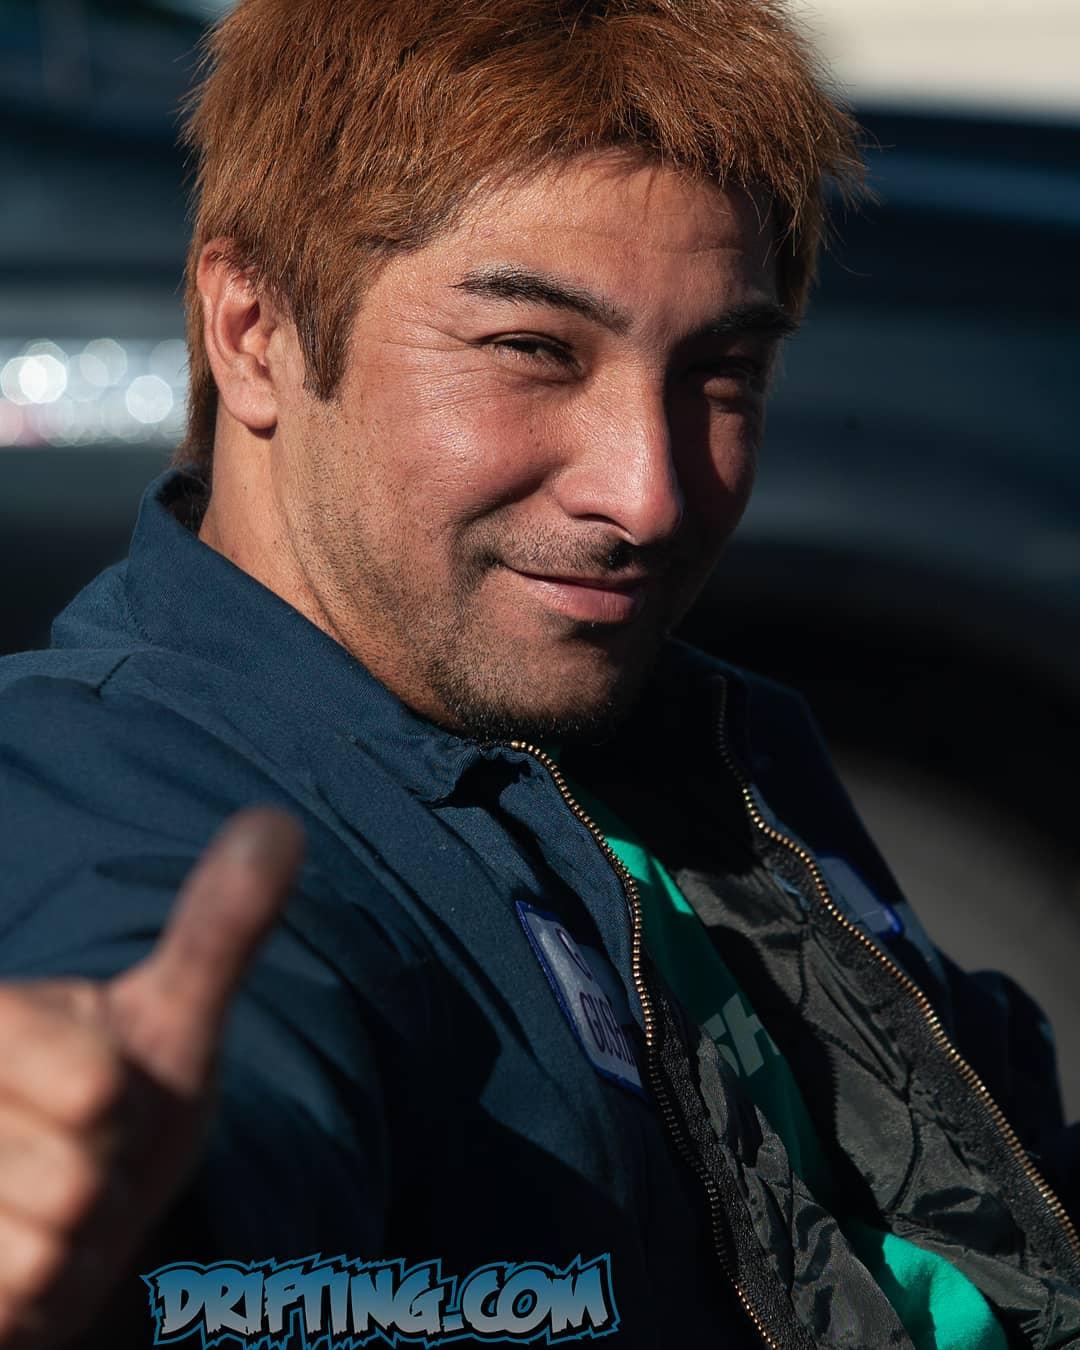 Mr. Gushi 2004 Photo by Alex